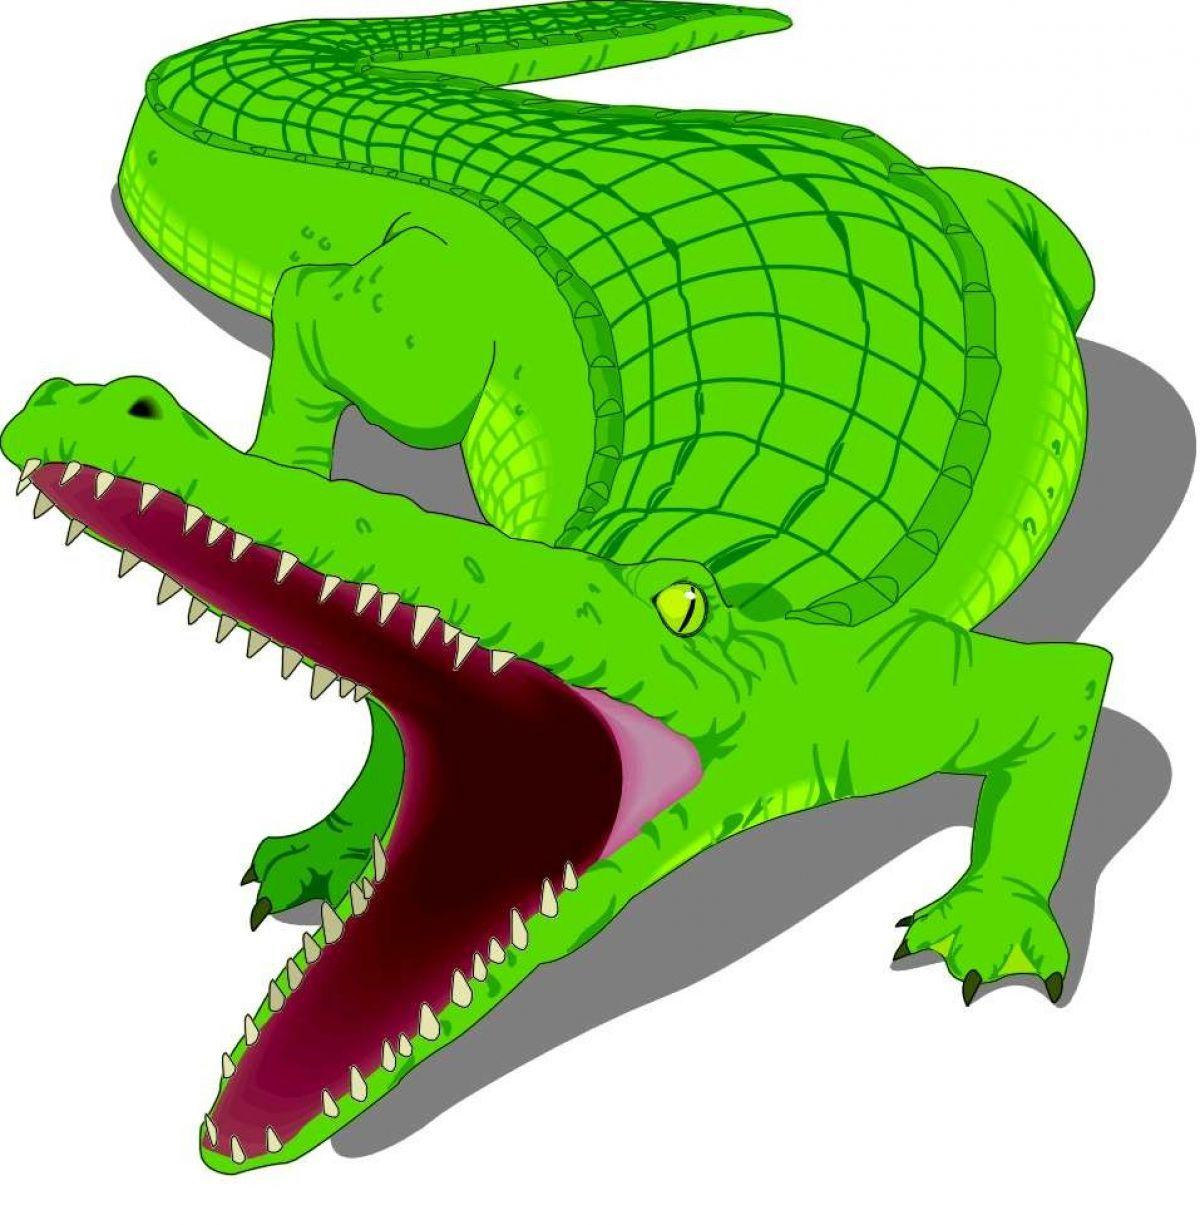 Alligator clipart green object  clipart  alligator